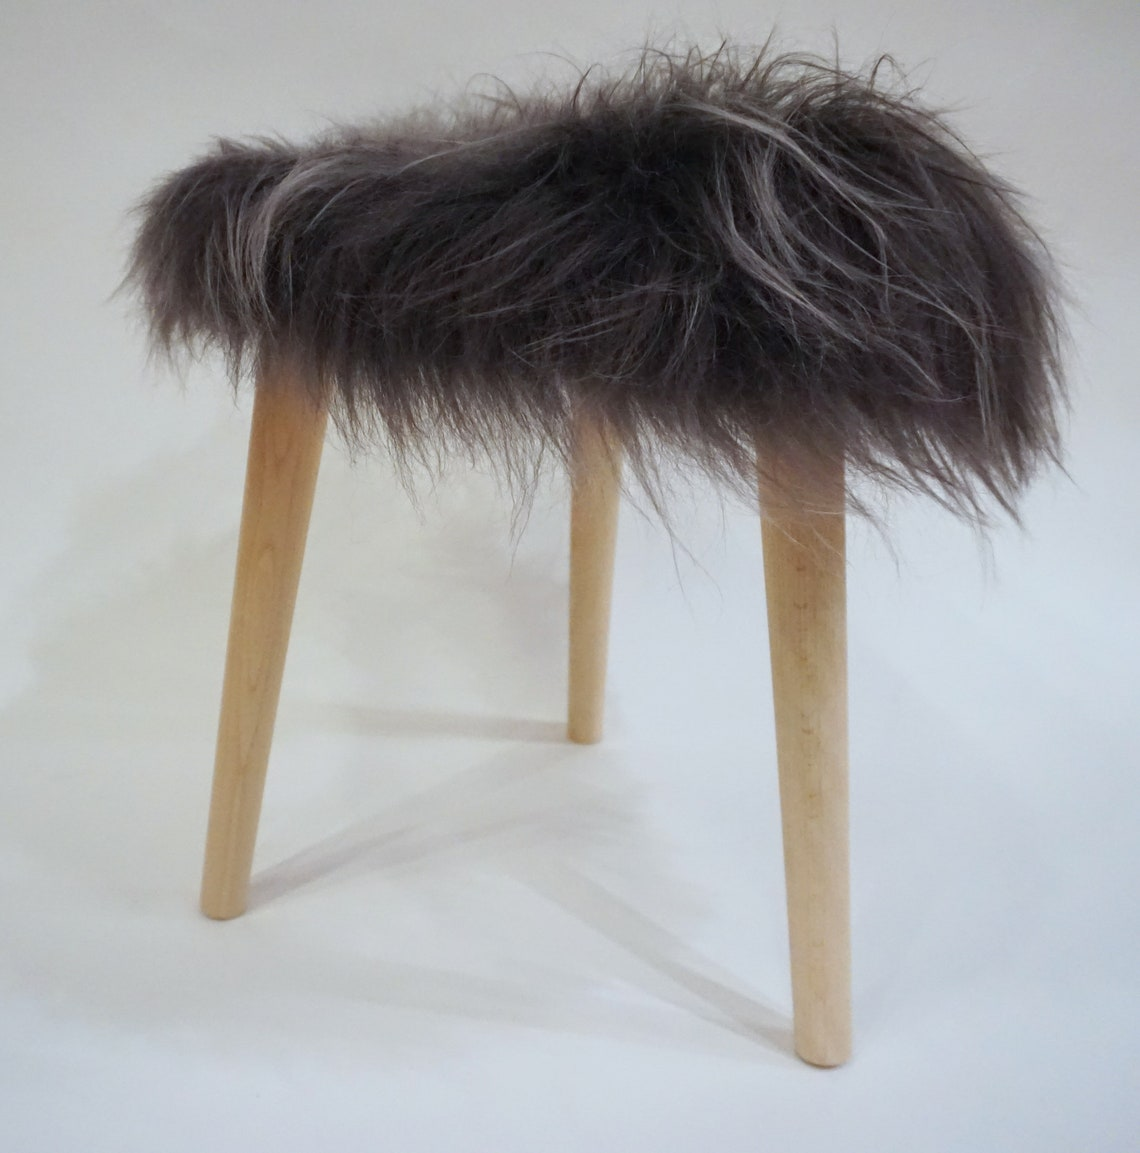 "Icelandic Sheepskin Round Stool - Real Fur In Slate Gray - 16"" wide x 17"" High"